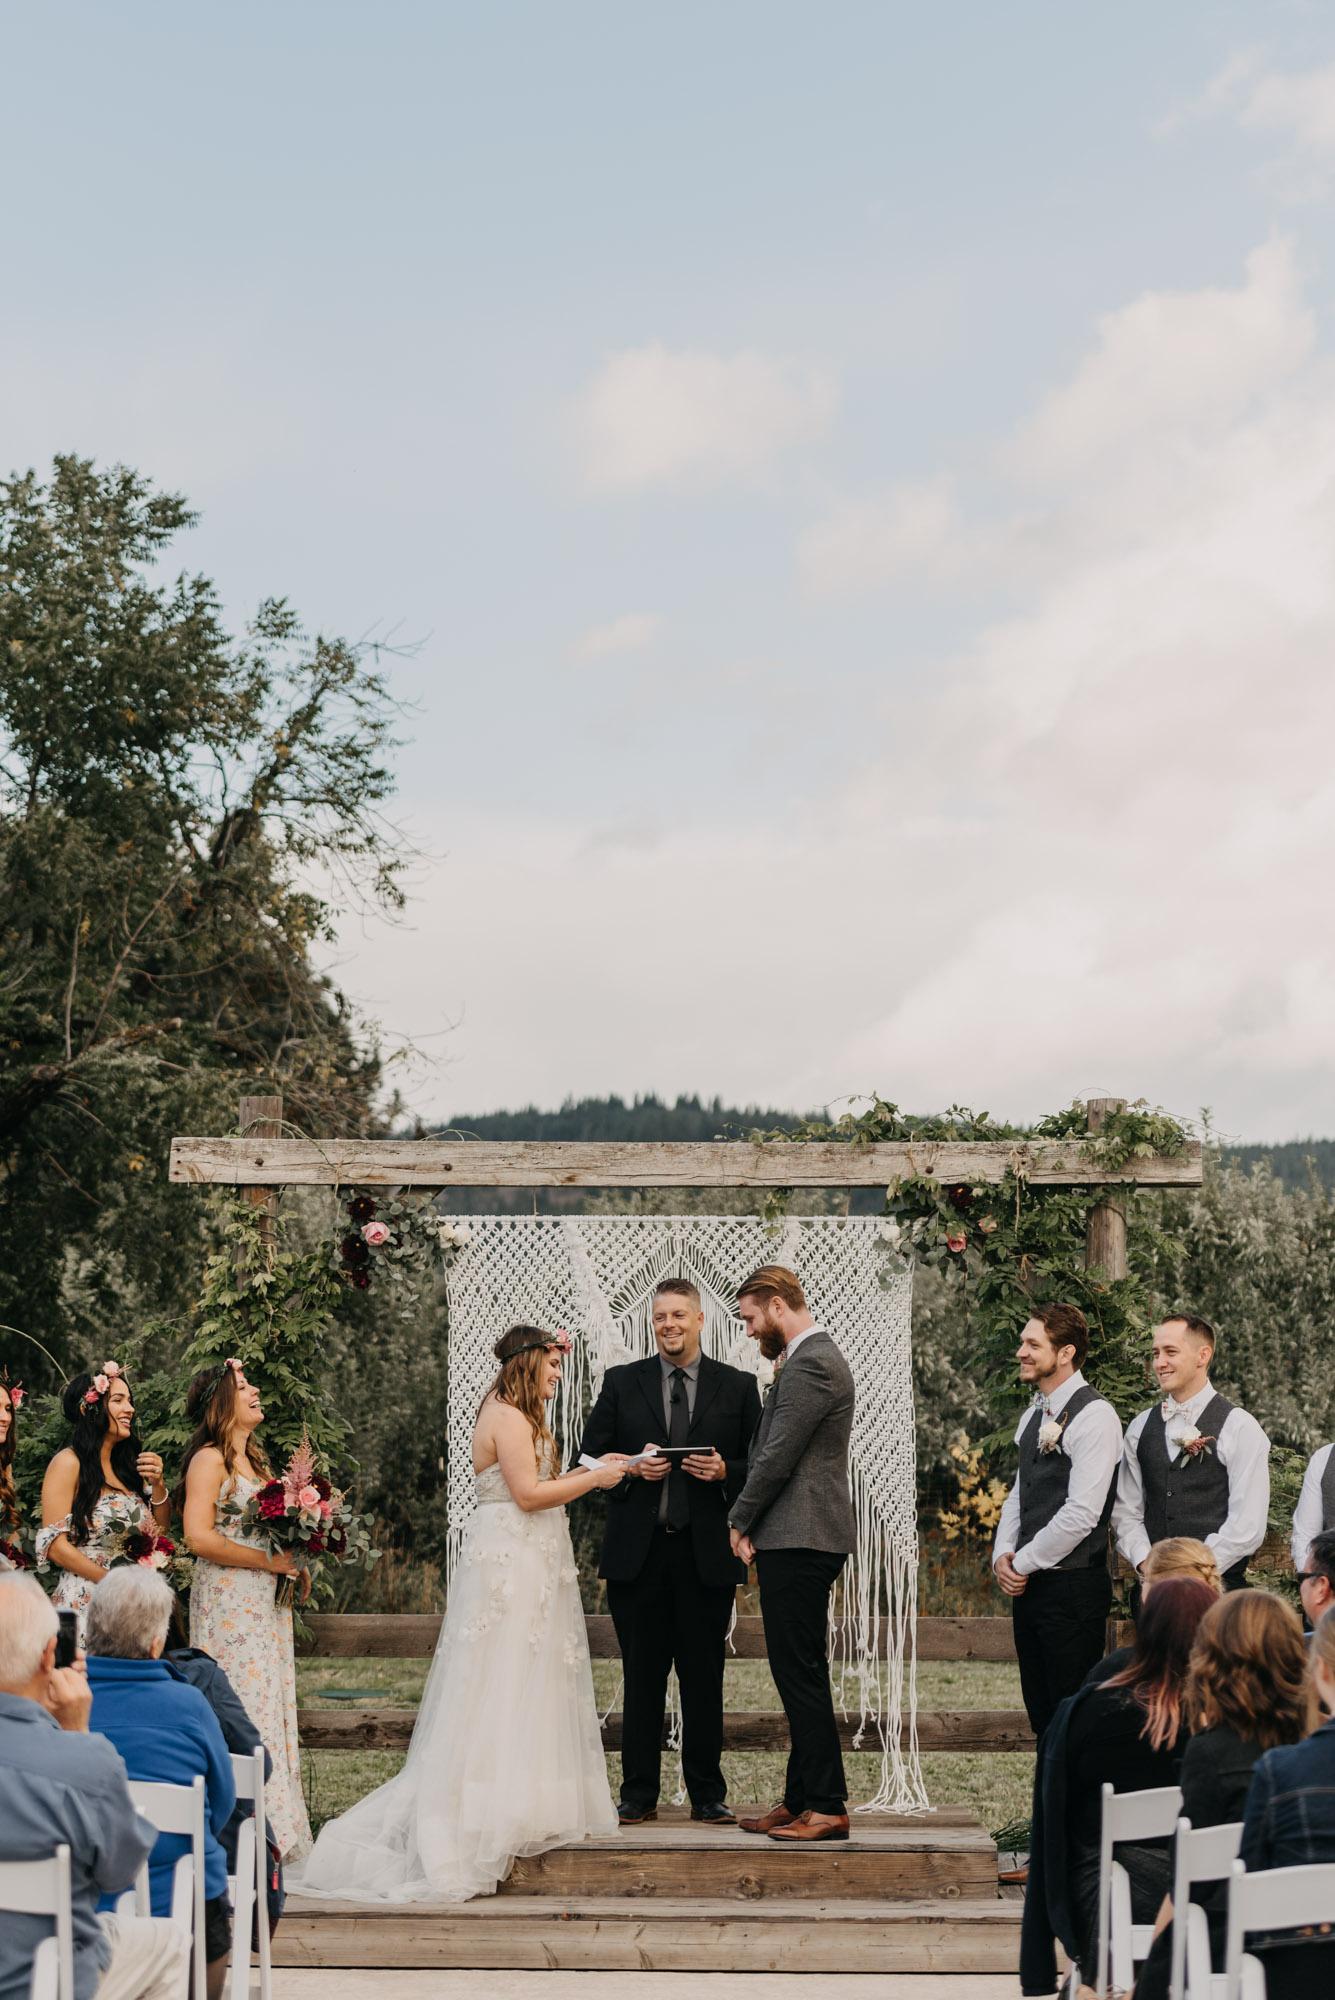 Outdoor-Summer-Ceremony-Washington-Wedding-Rainbow-9055.jpg